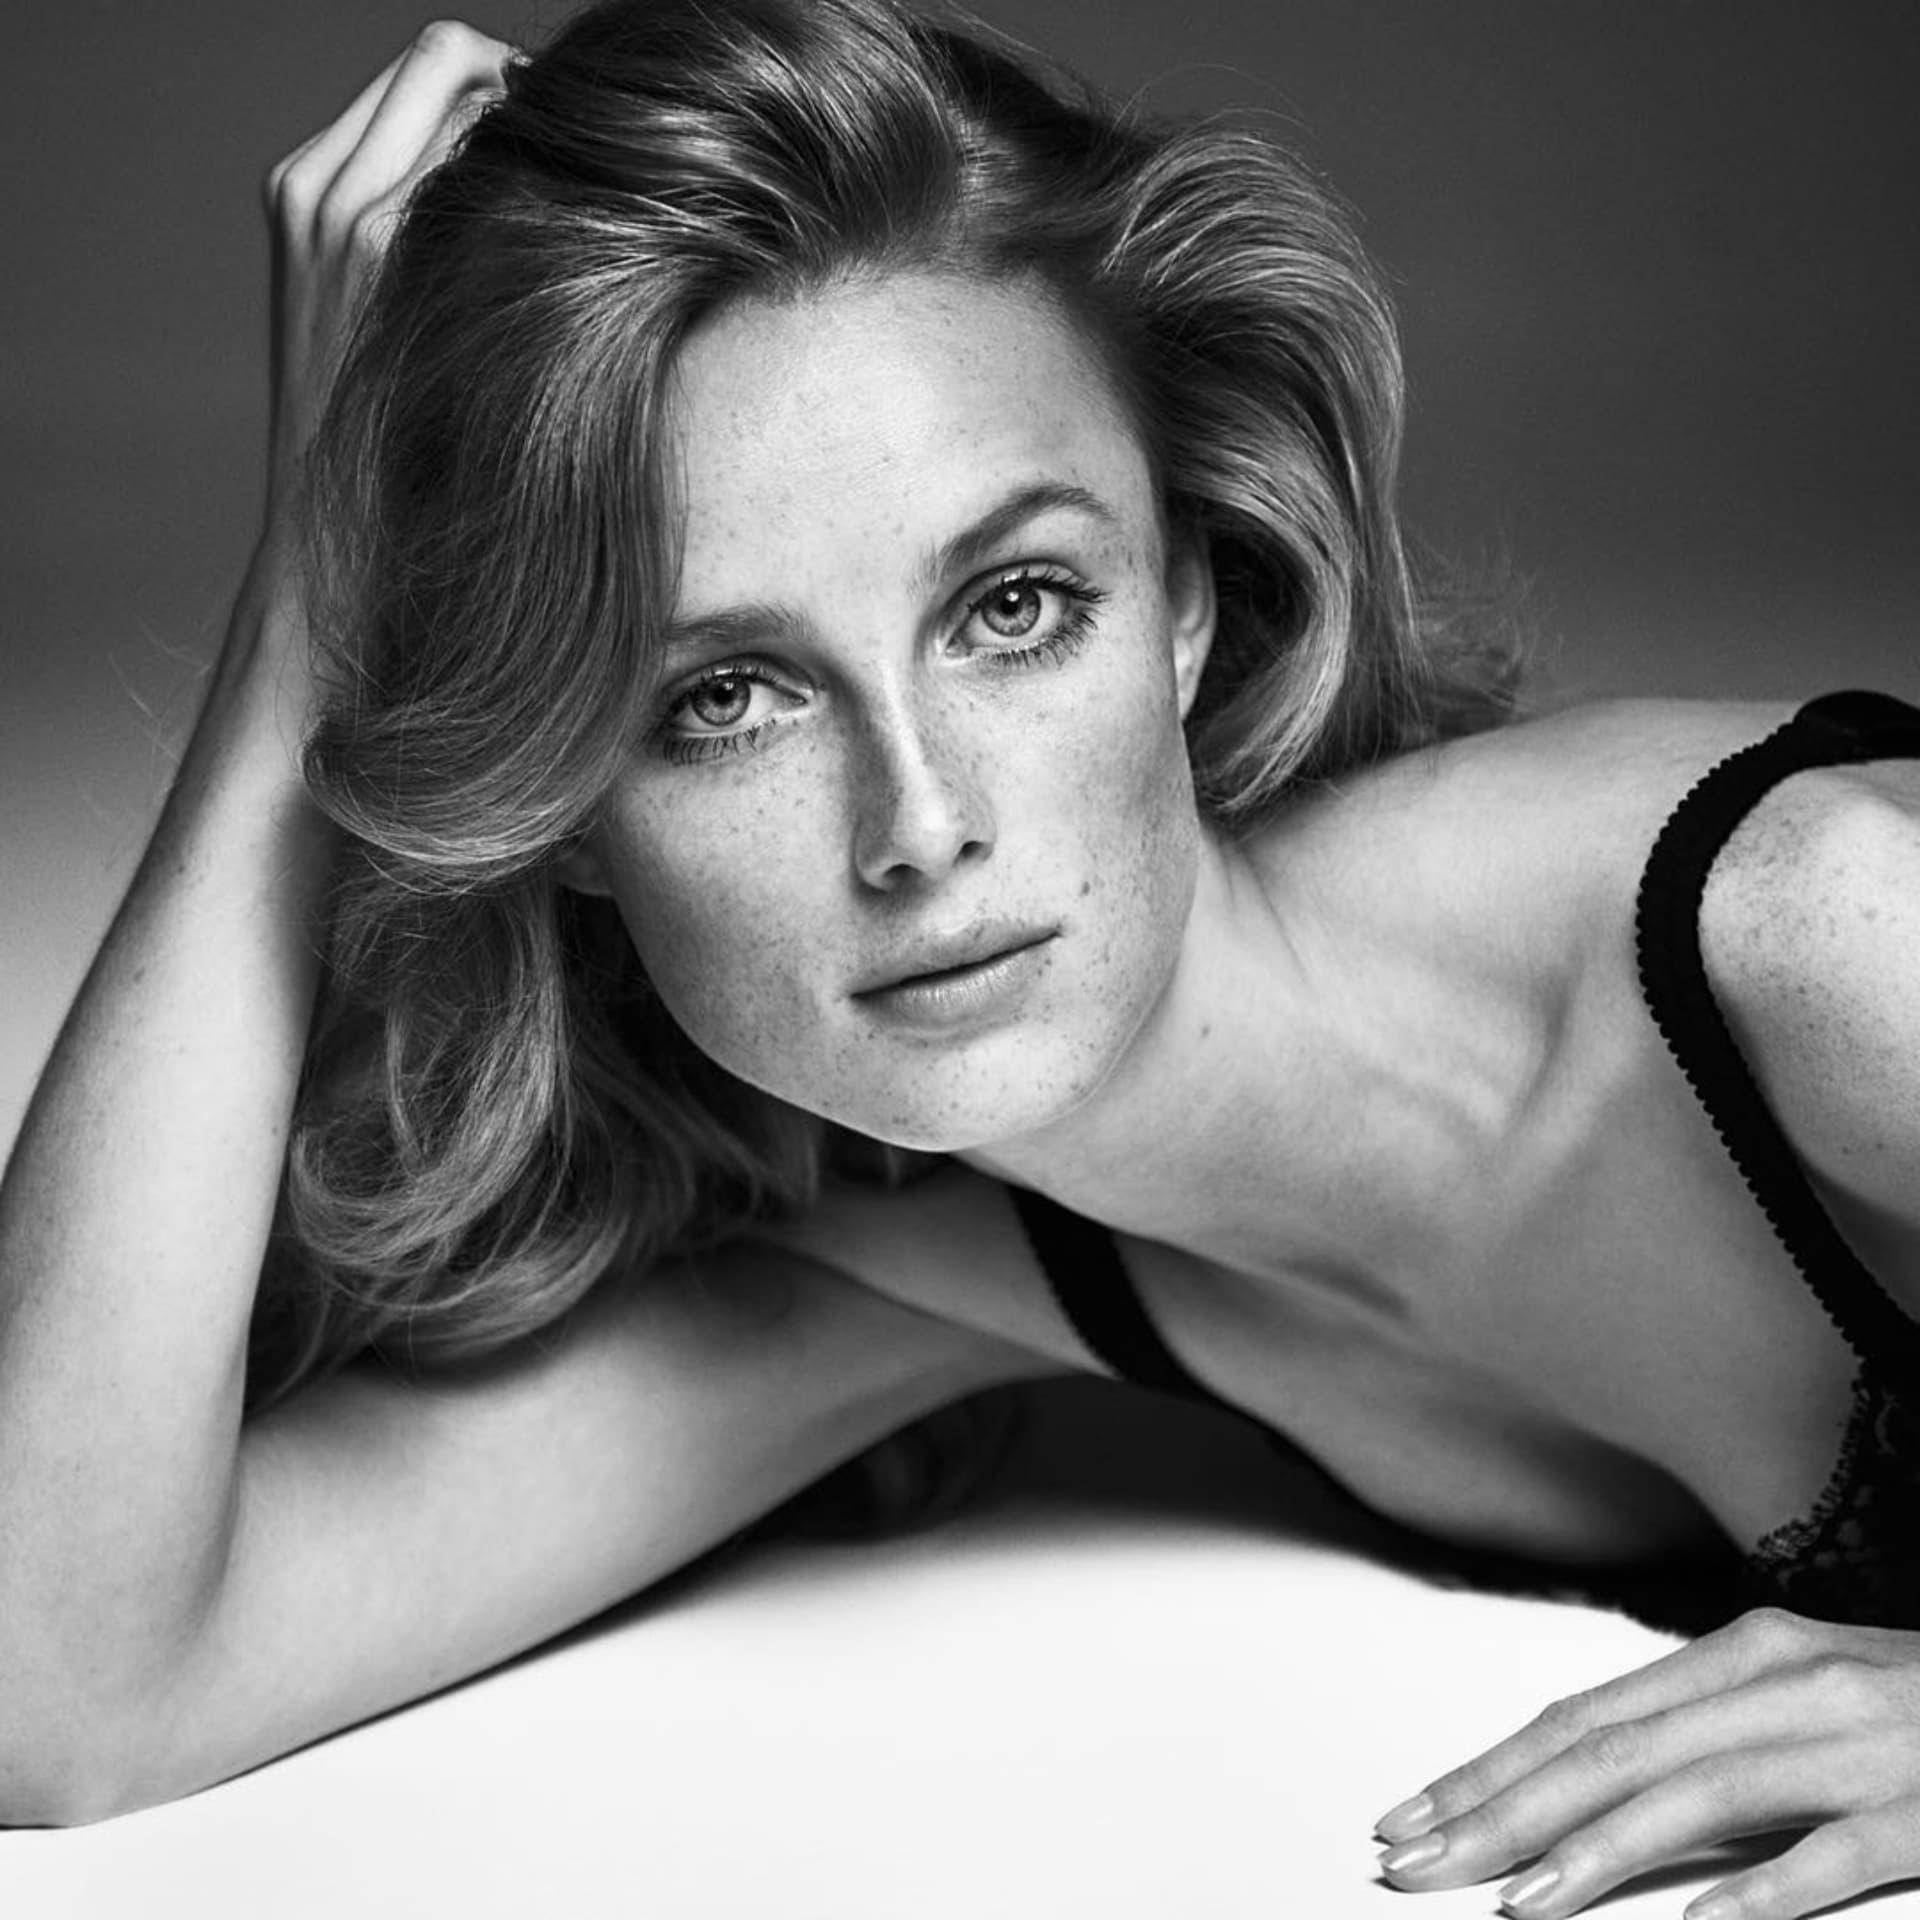 Rianne van Rompaey, la modelo holandesa del momento